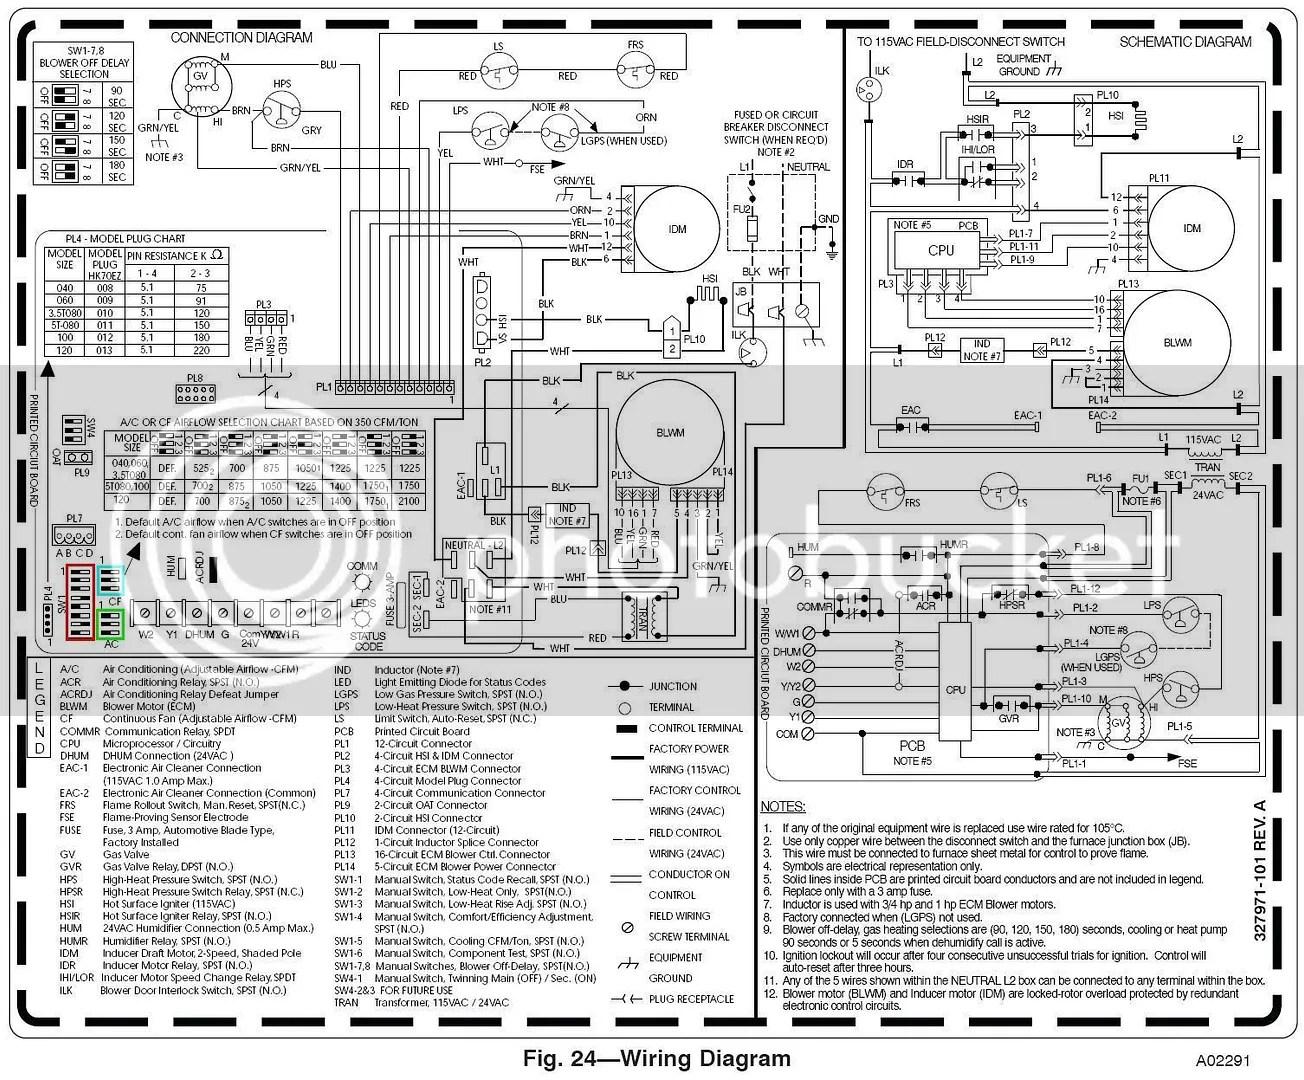 mars 10586 wiring diagram free nissan altima wiring diagram pdf  inspiring mars motors 10587 wiring diagrams images best image carrier 58mvp diagram zpsmgaigigg mars